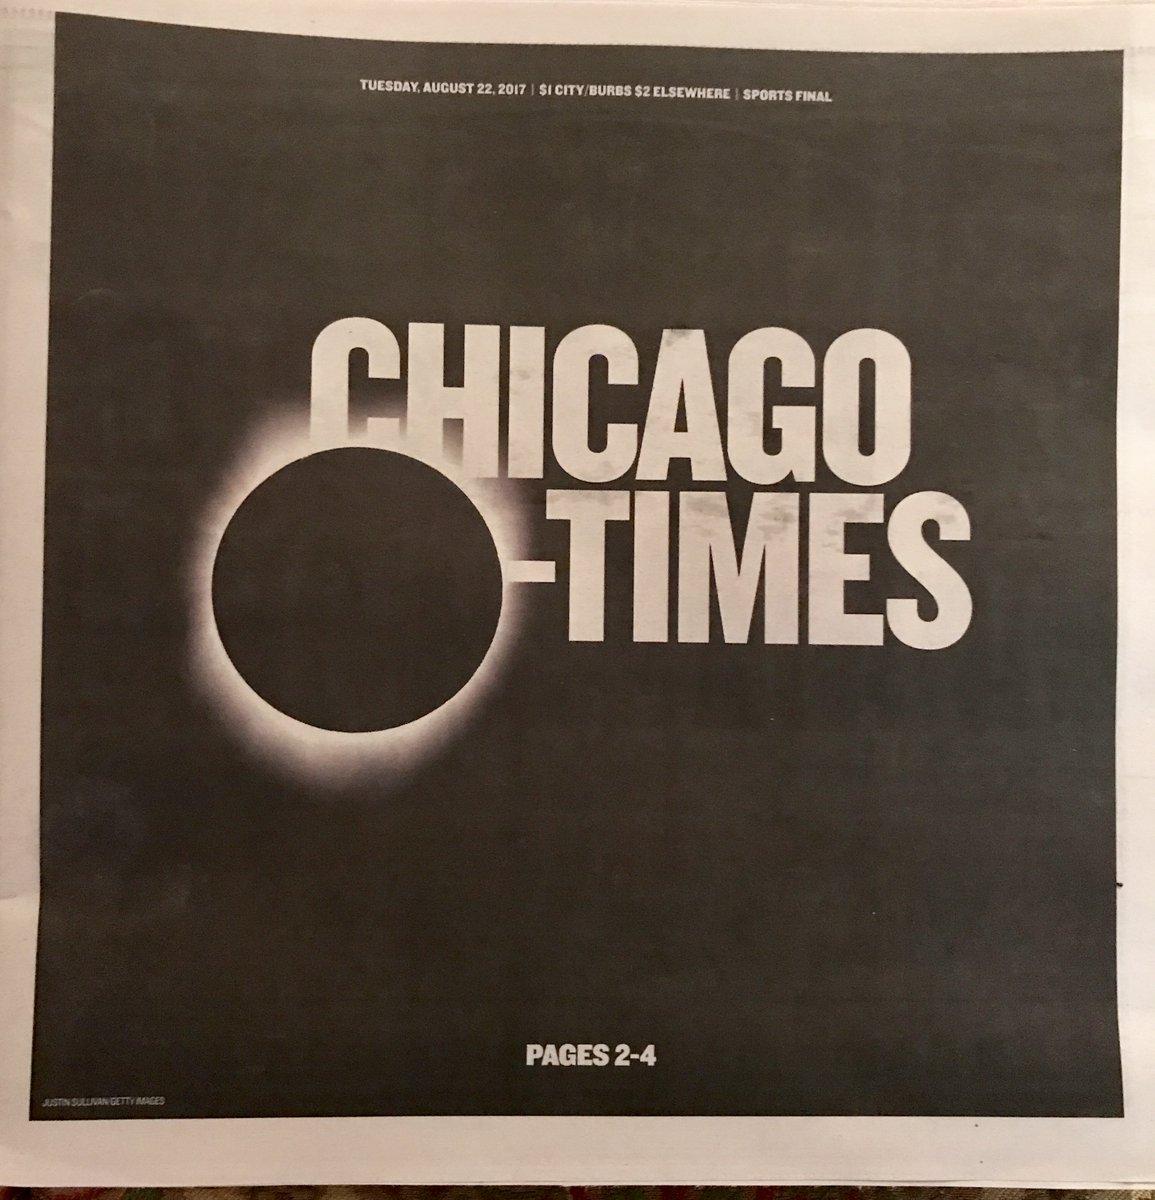 Roger Ebert's New Chicago Sun-Times Sees the Light of Day